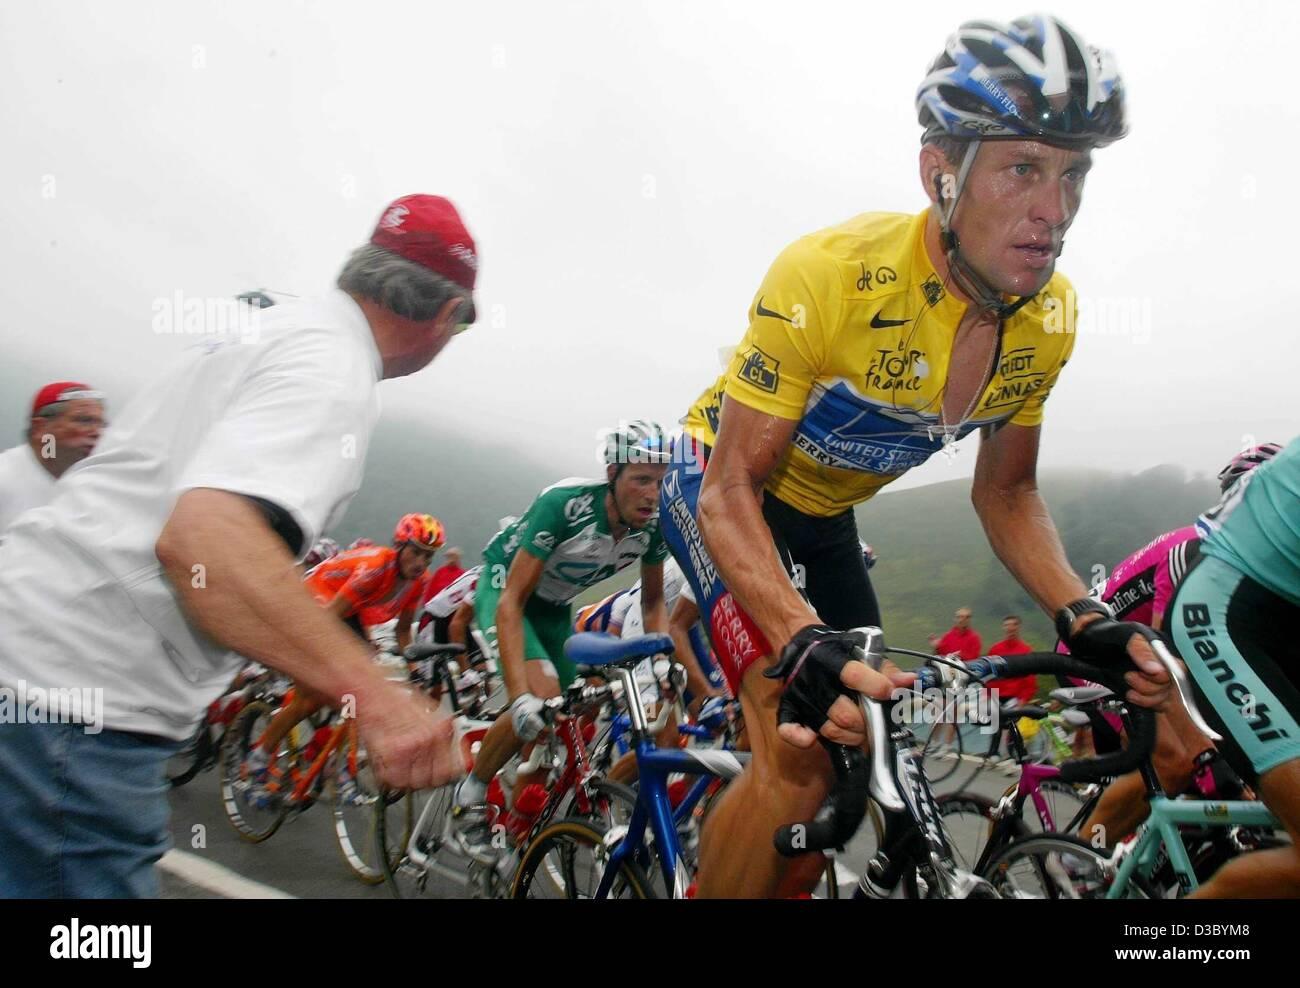 Sports Spo Cycling Us postal Tour de france France Stock Photos ... 44f69db8d